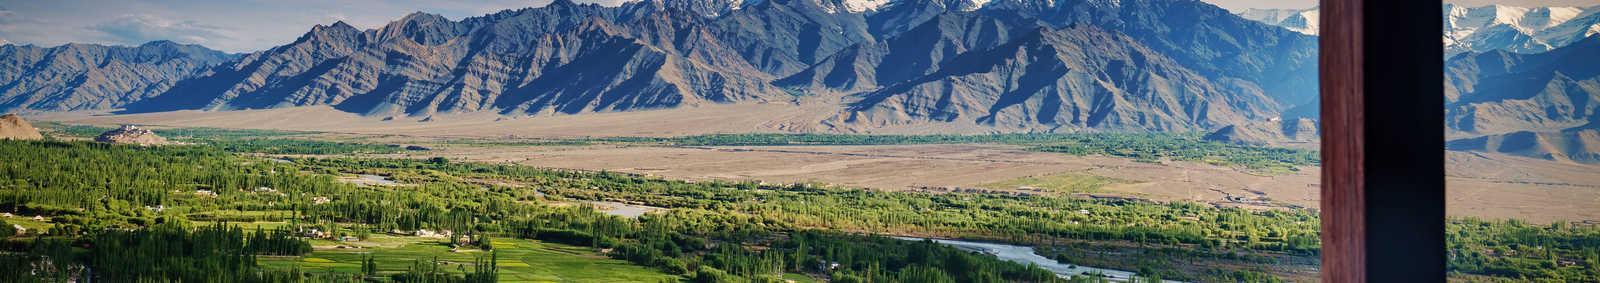 Ladakh window view